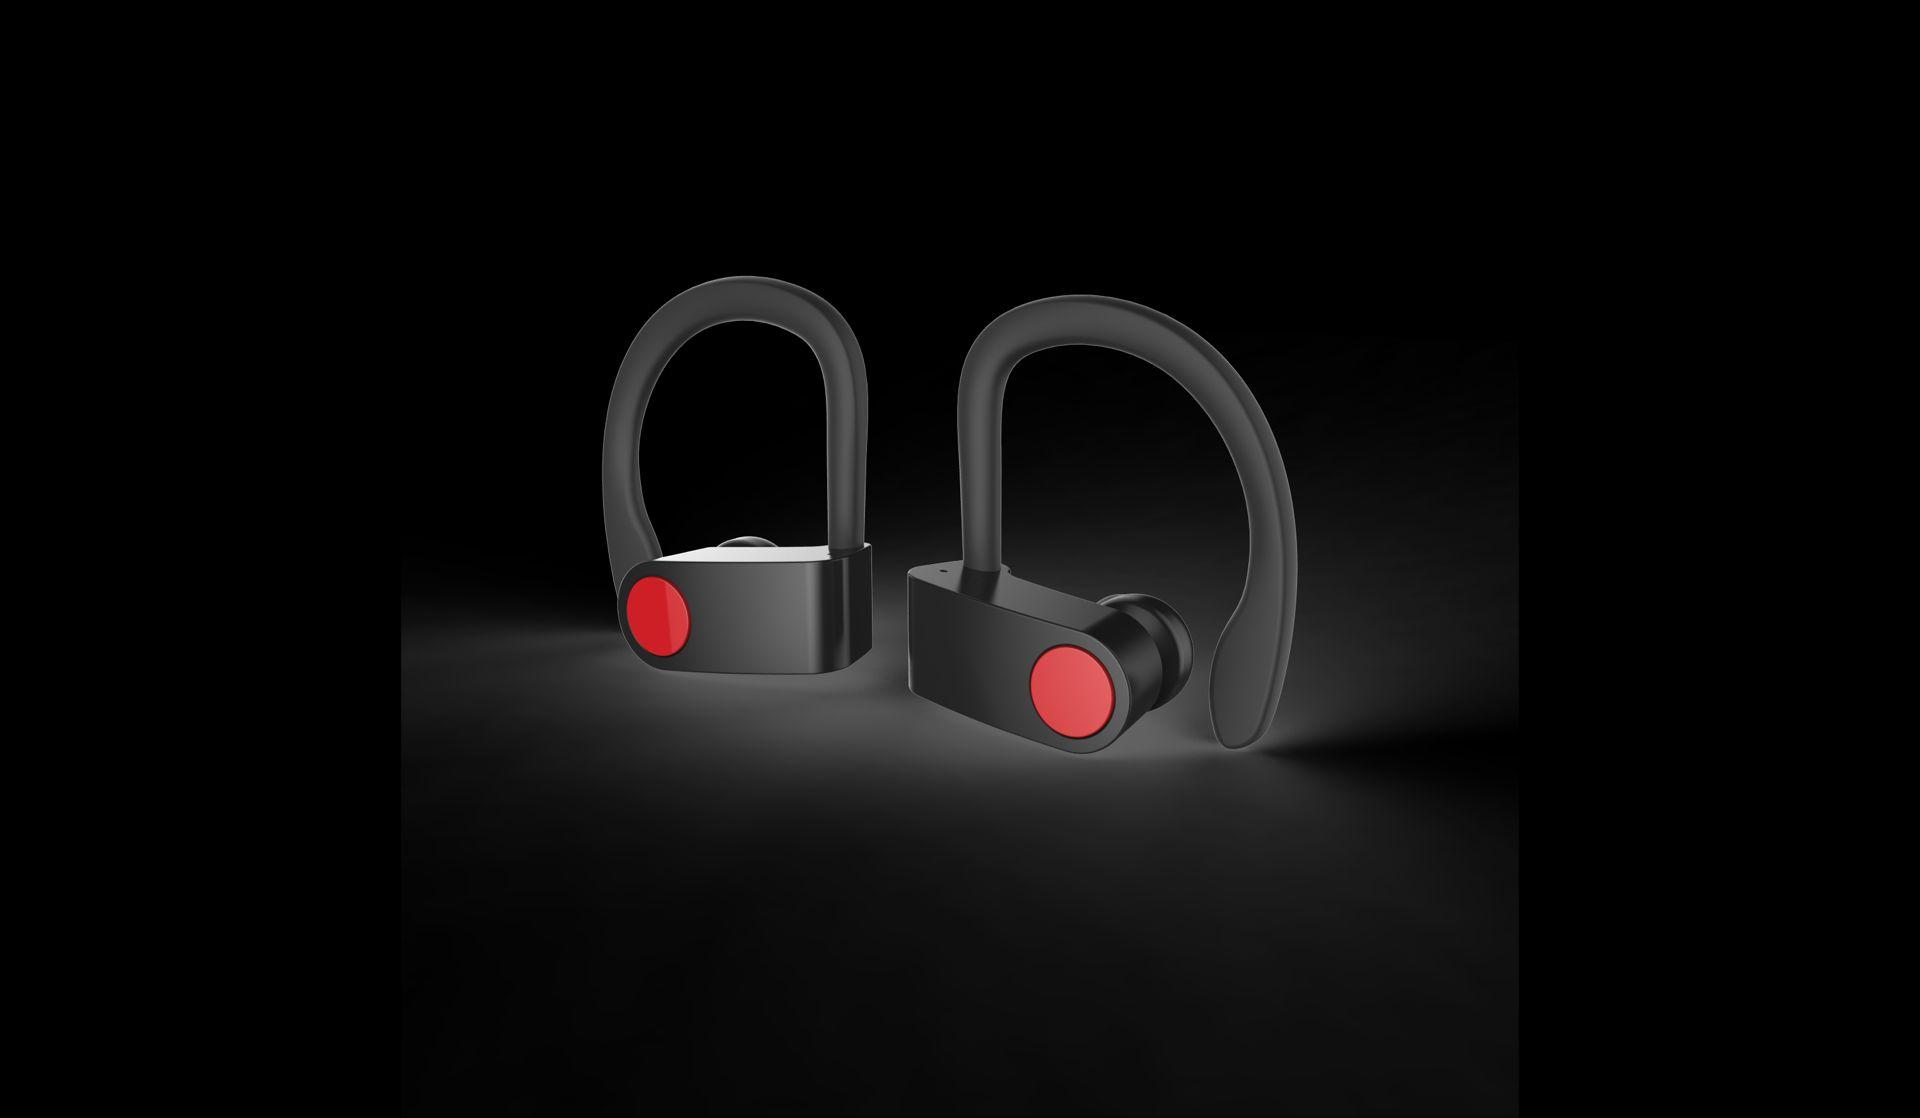 TWS earphone